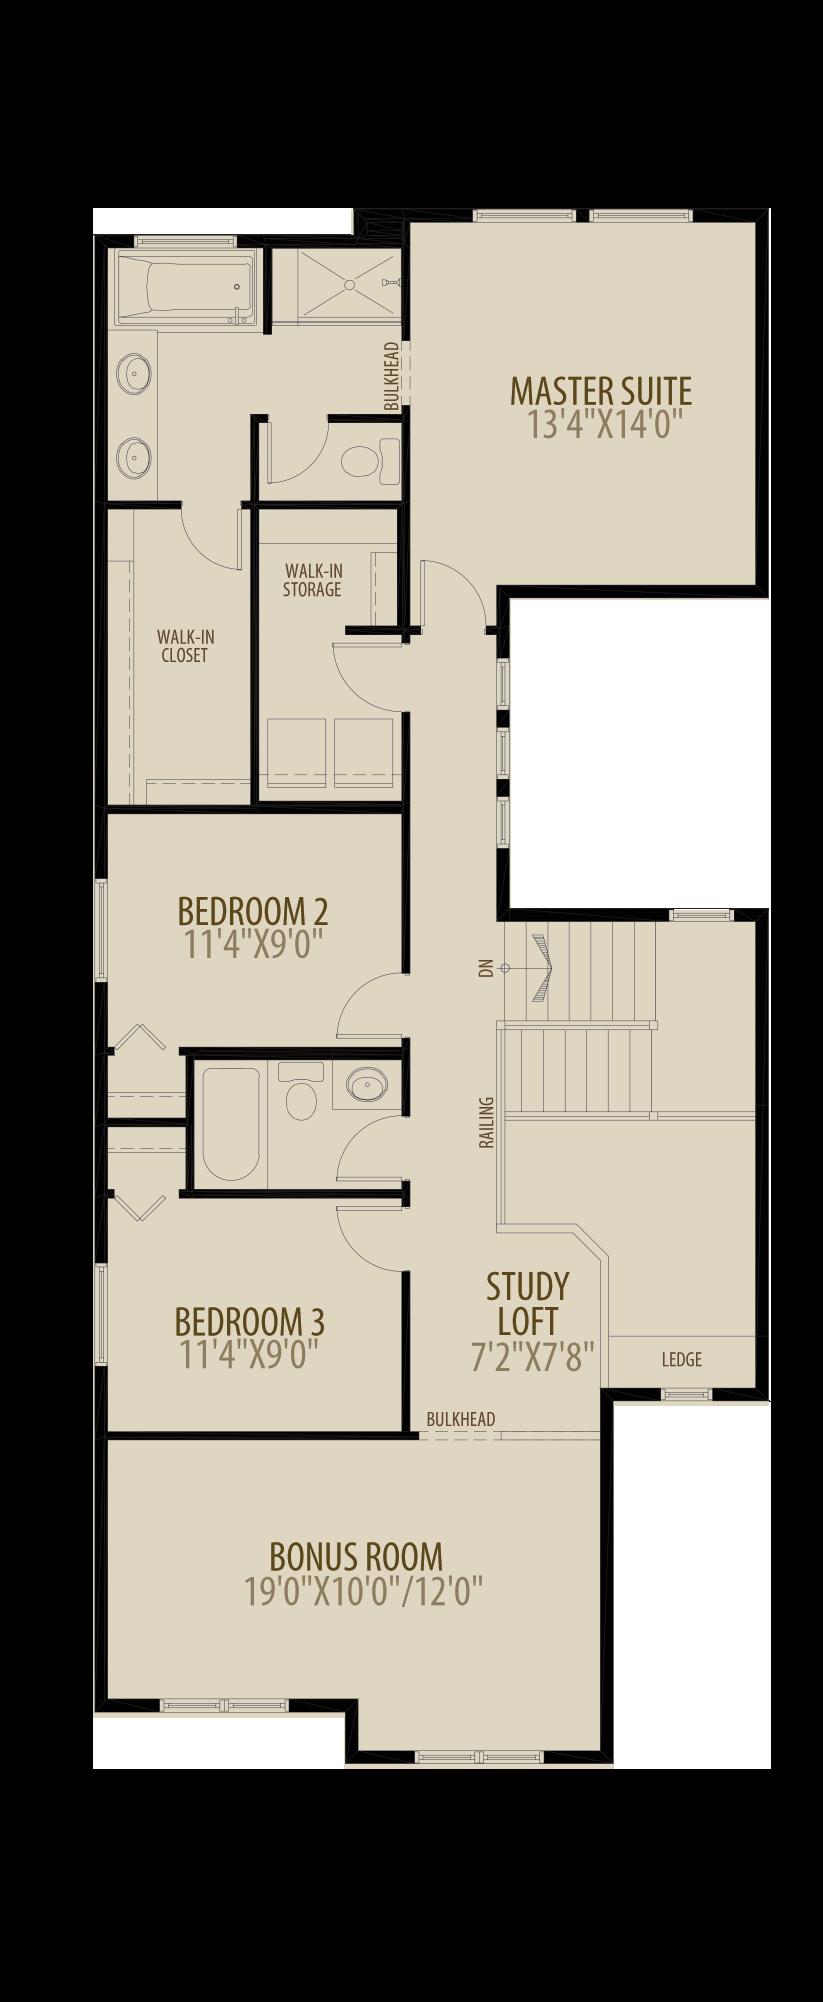 Revised Upper Floor adds 20 sq ft